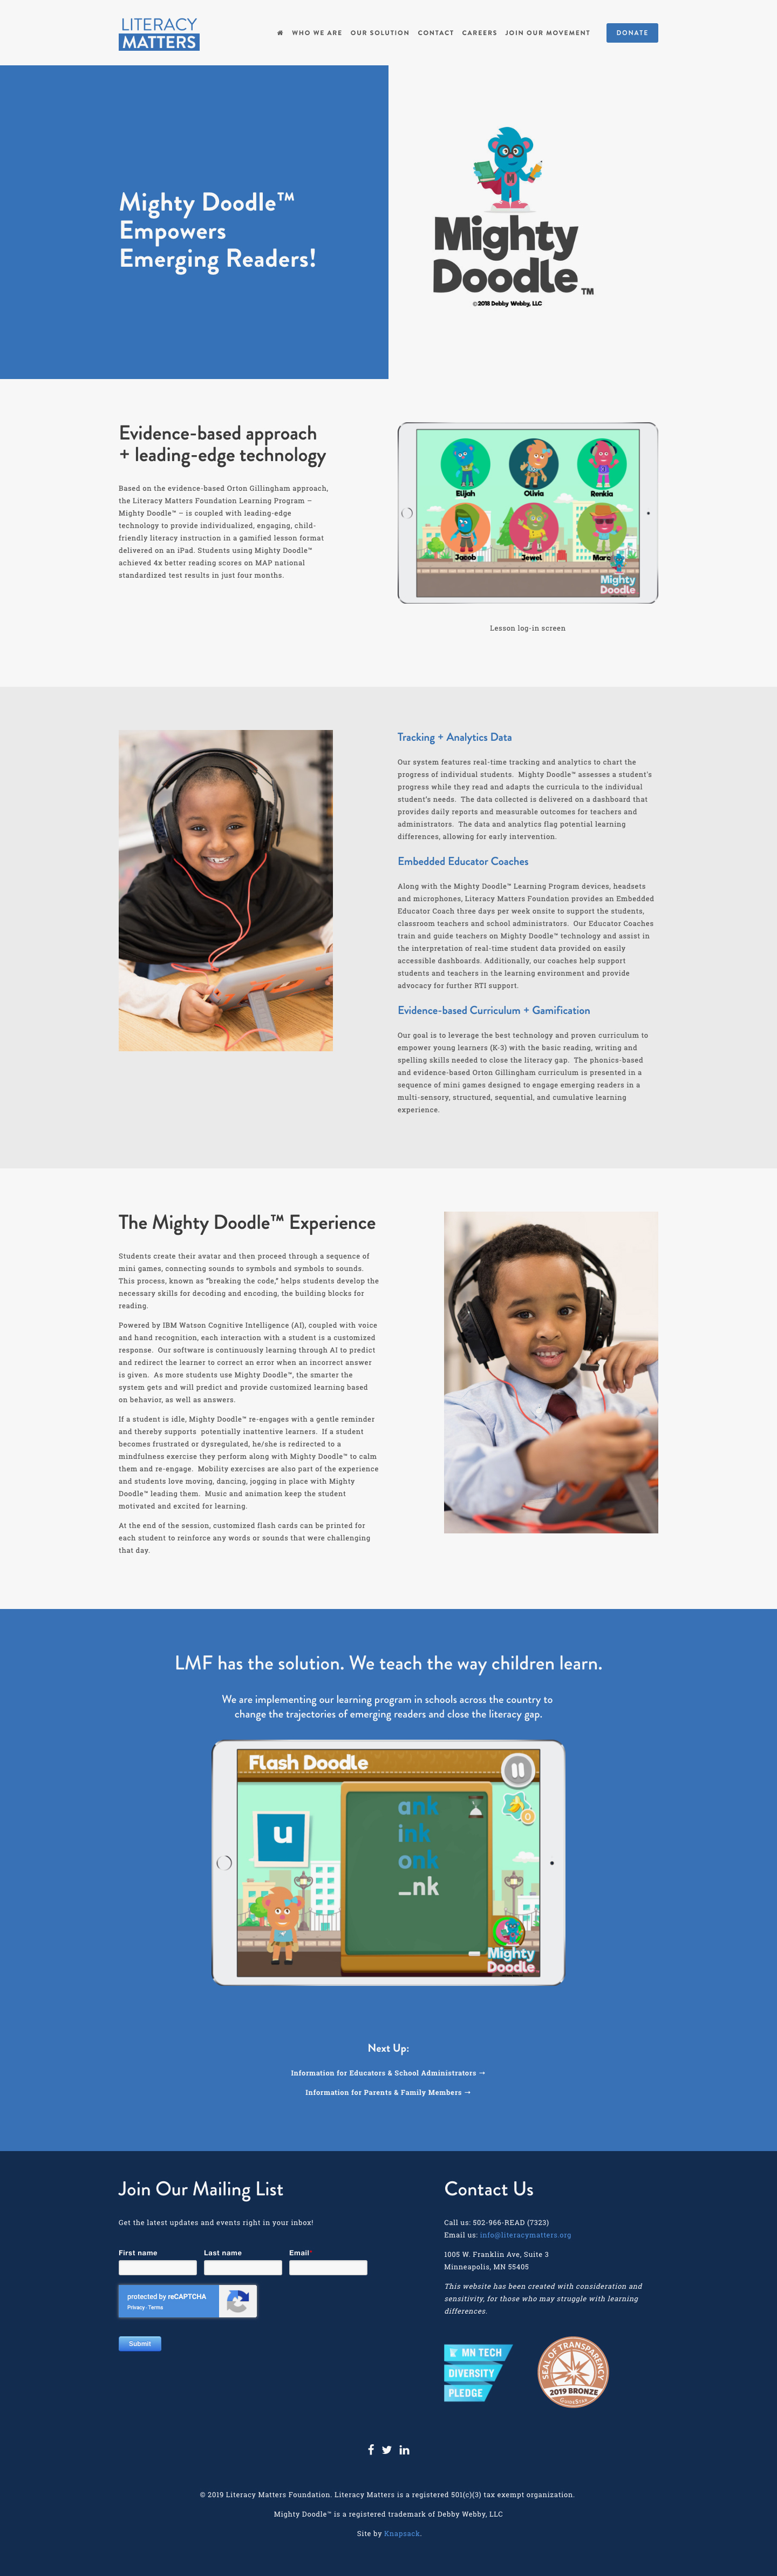 LiteracyMatters-MightyDoodle-Mac-Overlay.jpg